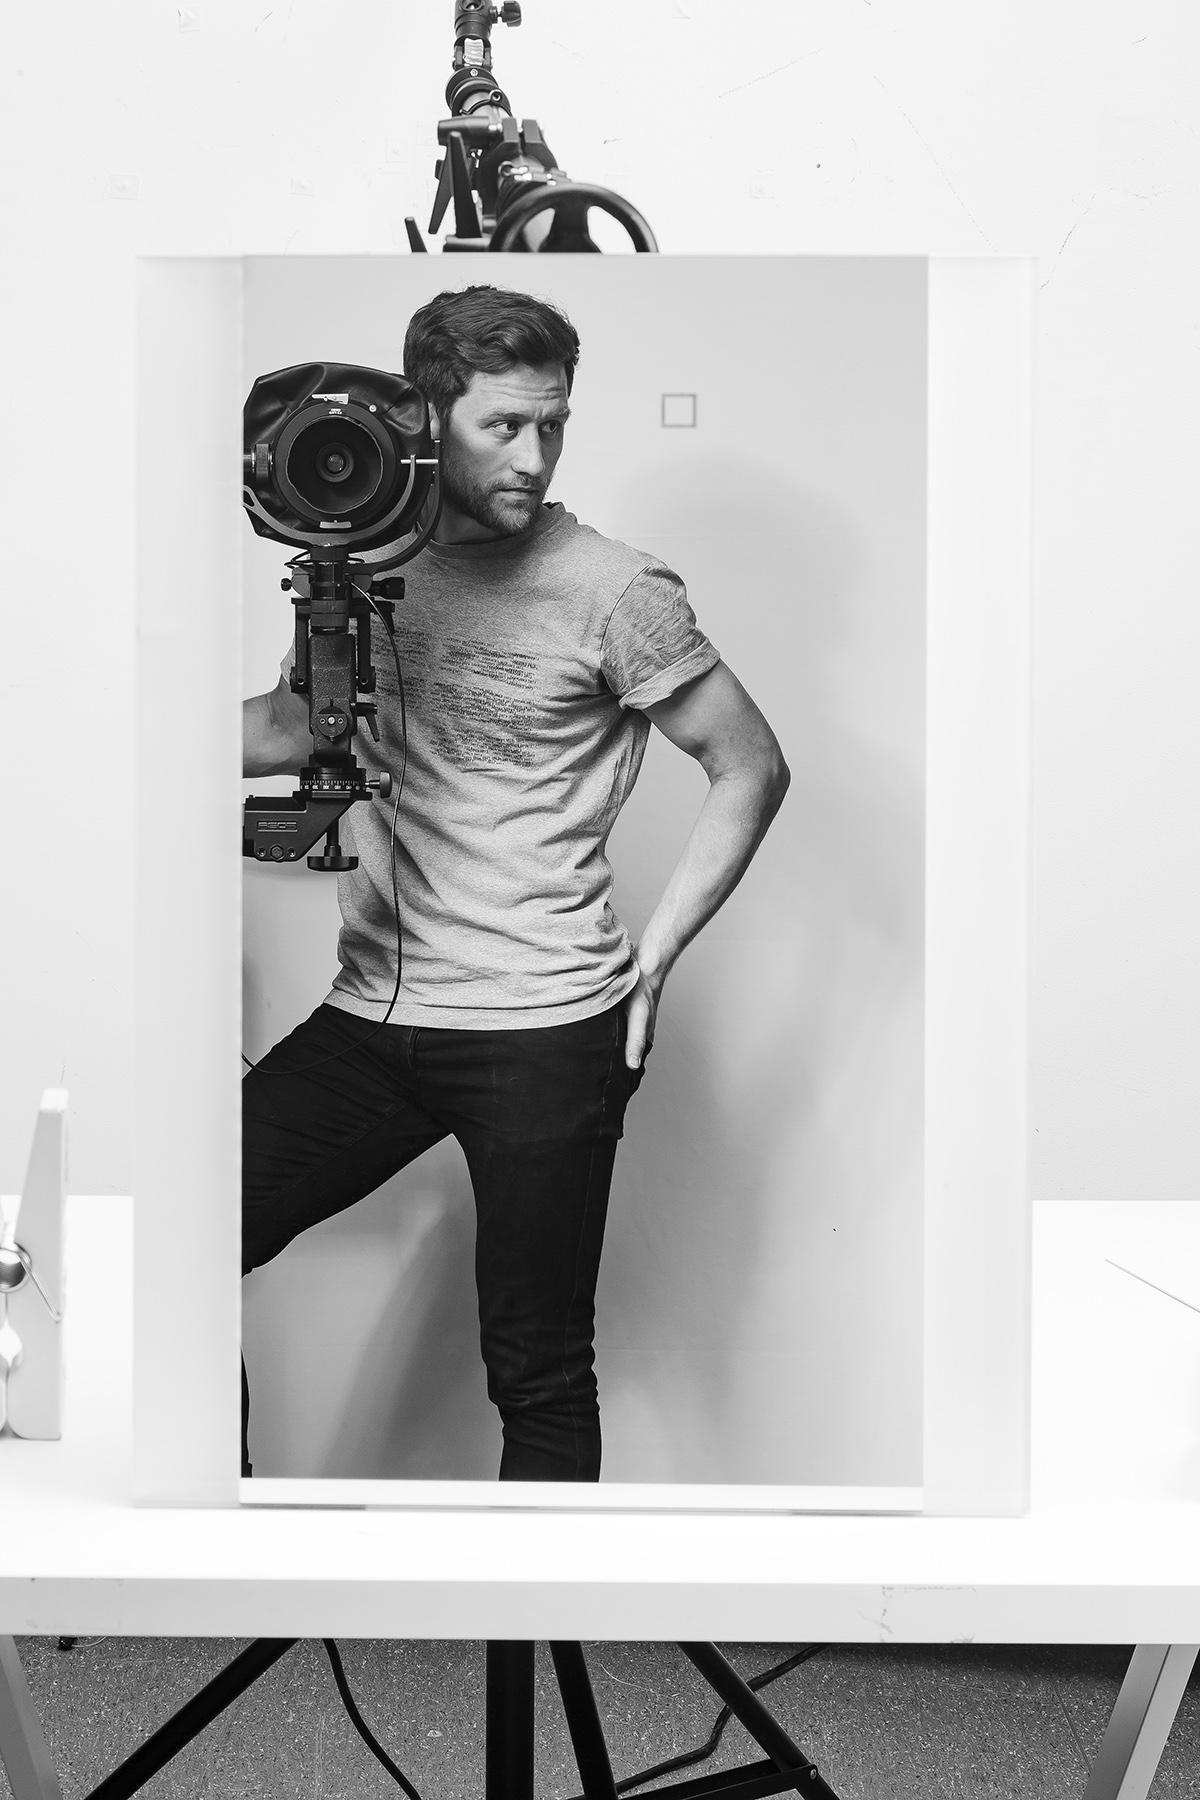 Fotograf Dimitri Reimer hinter seiner Studiokamera